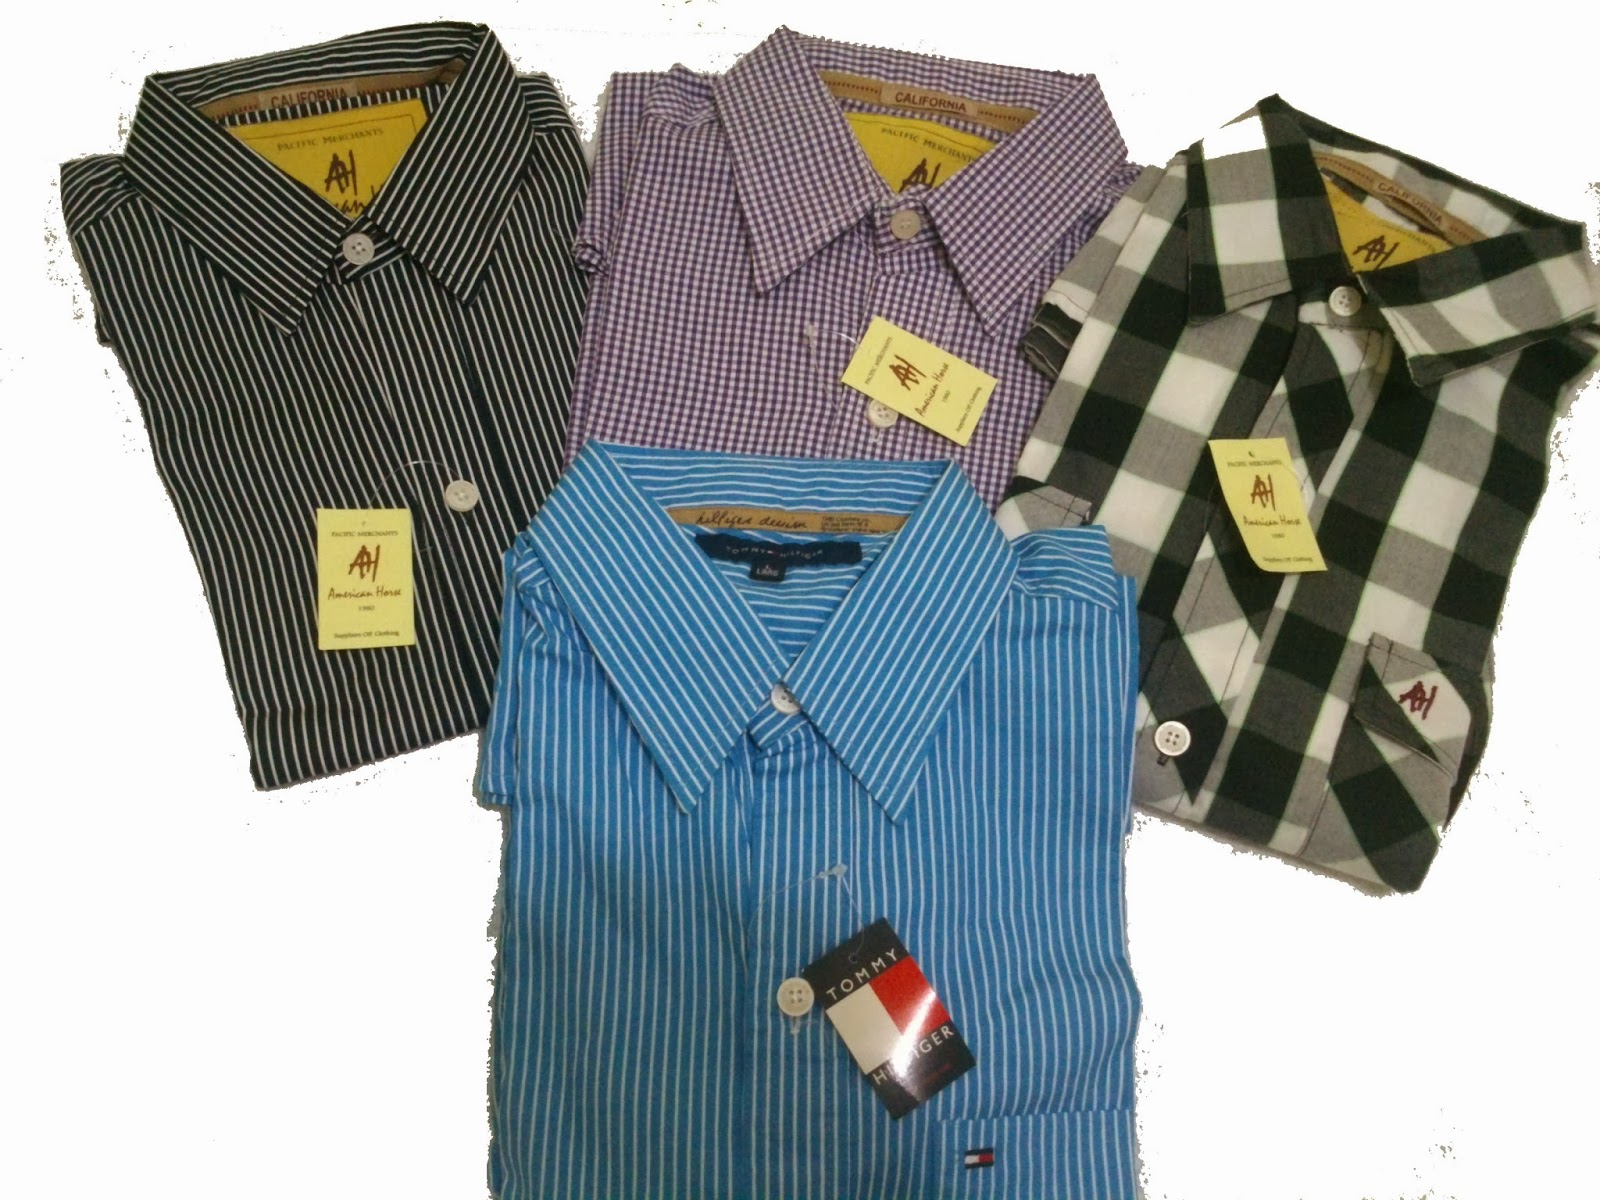 imagenes de camisas de hombre manga larga - Gant Camisa regular fit de manga larga para hombre